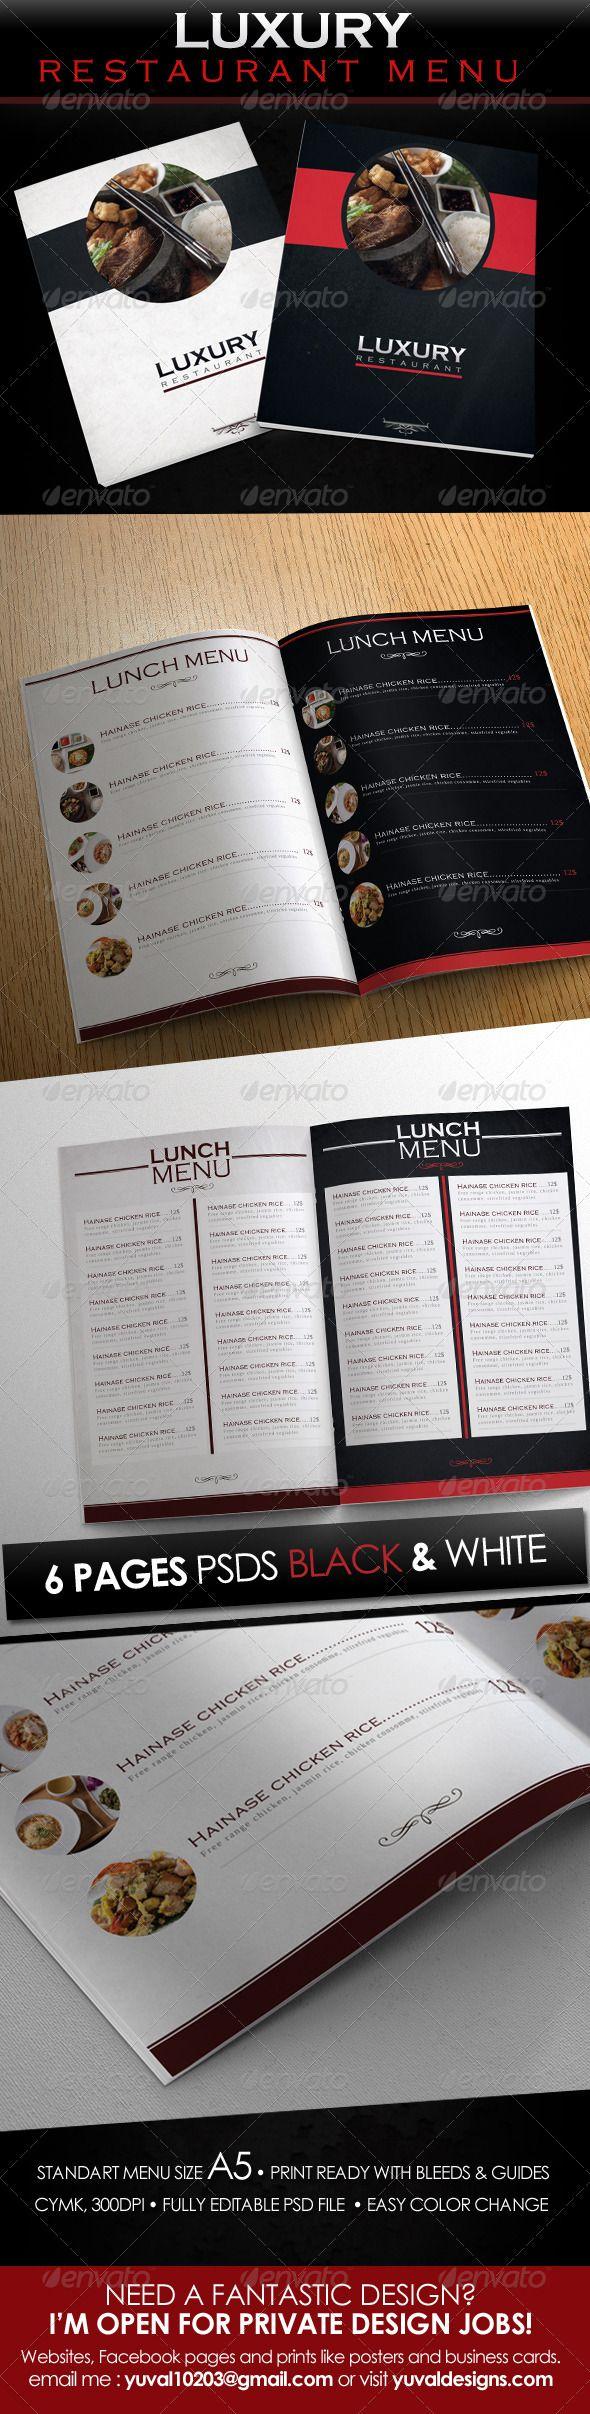 Luxury Restaurant Menu Design Template - Food Menu Print Template PSD. Download here: http://graphicriver.net/item/luxury-restaurant-menu-design-template/4398674?s_rank=84&ref=yinkira